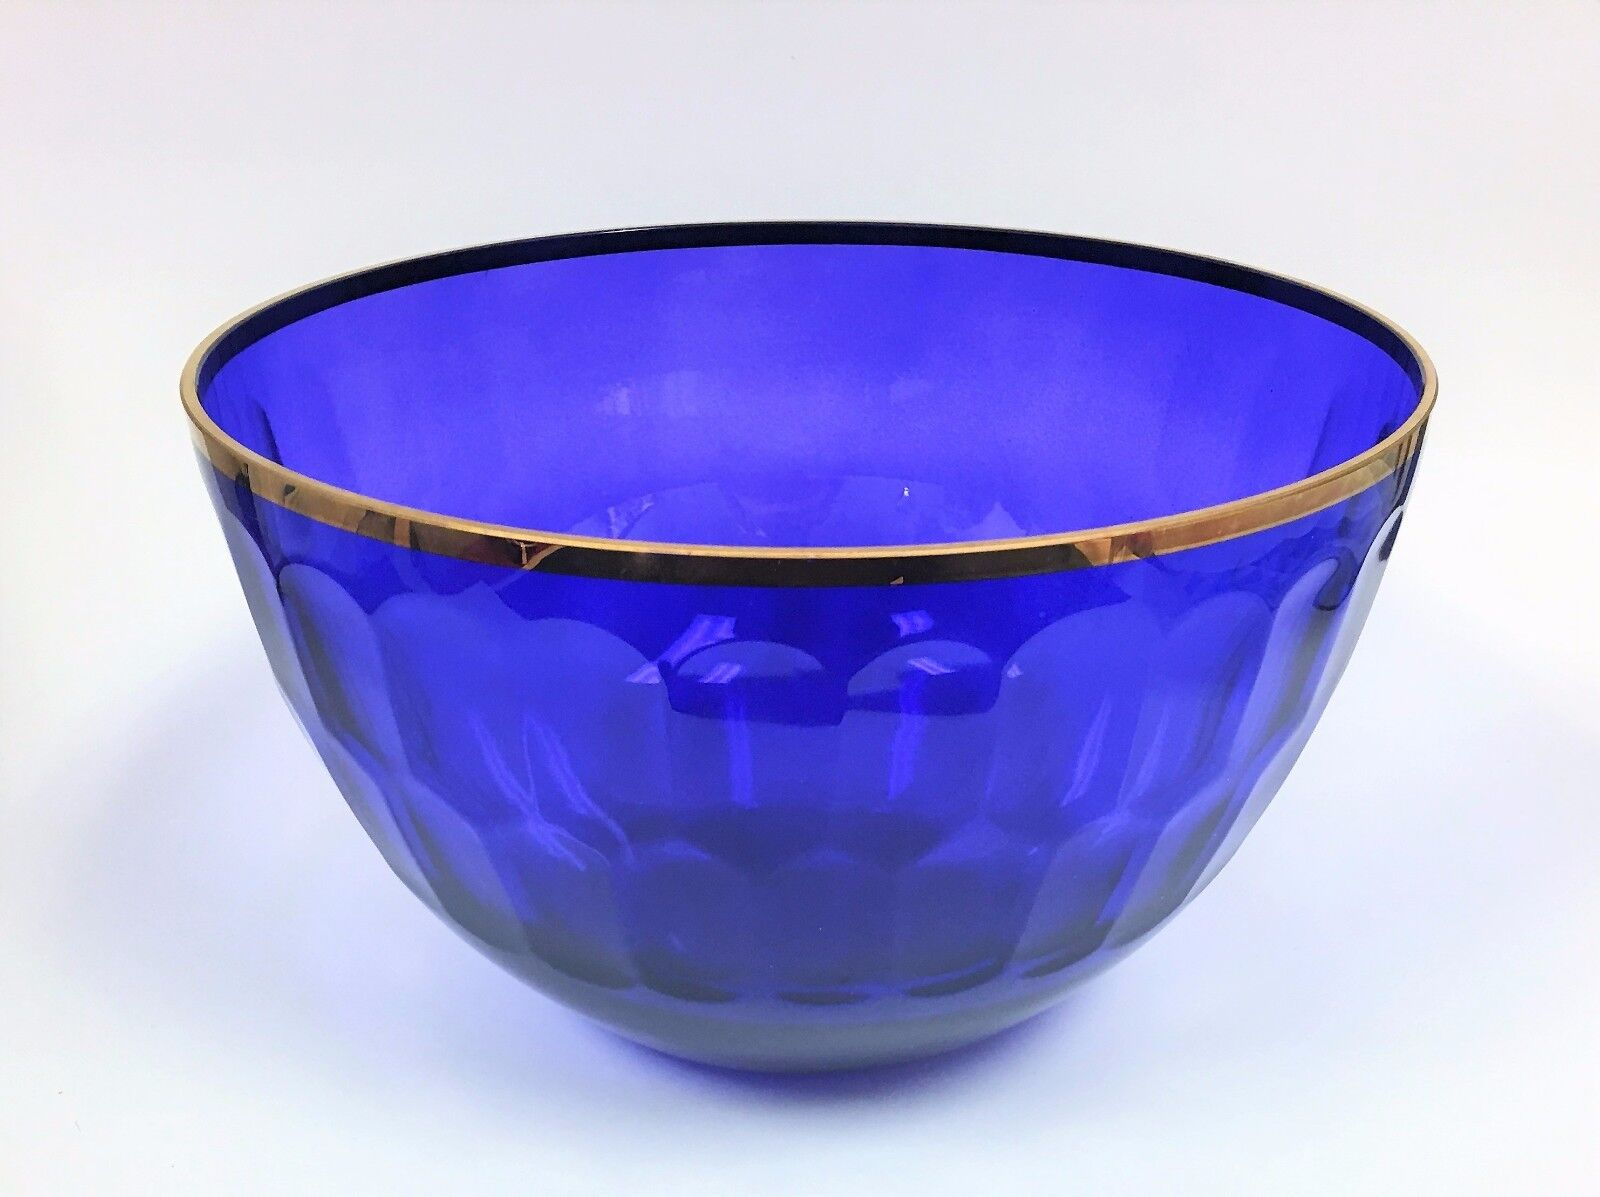 Neu Oscar Oscar Oscar De La Renta Glas Kobaltblau + Goldener Rand Galerie Medizinische 393ad0